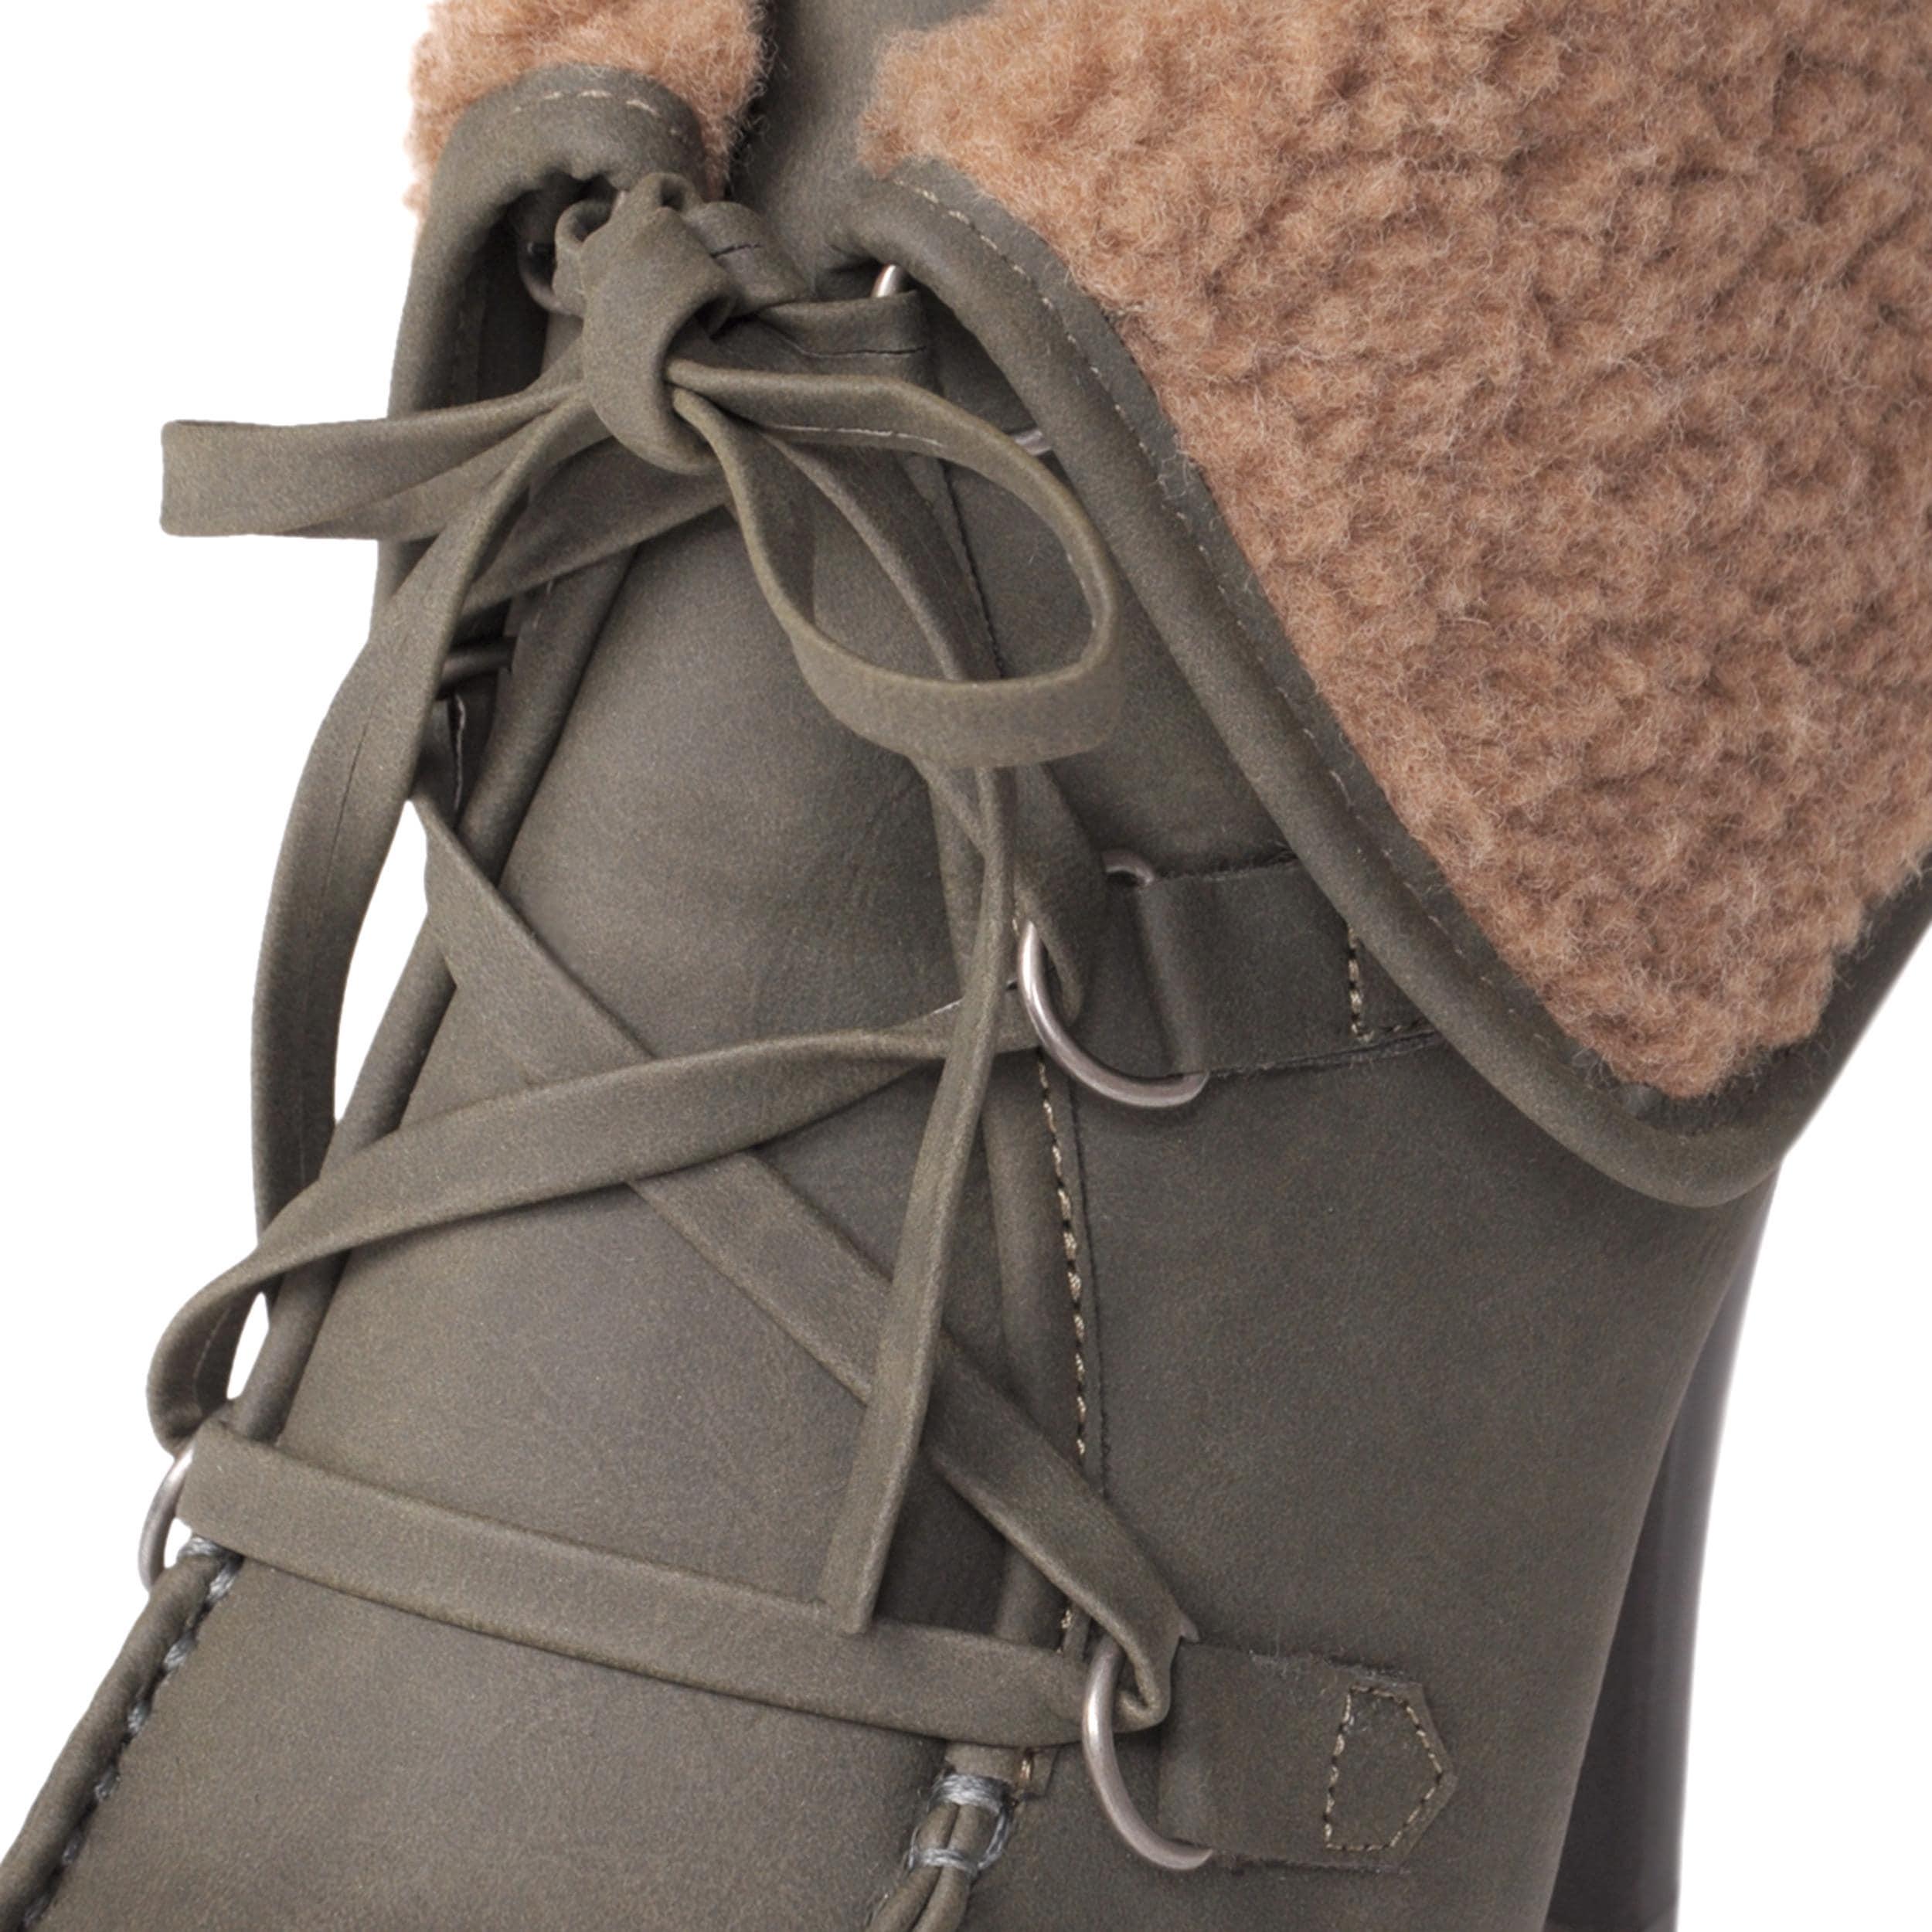 Journee Collection Women's 'LOA-09' Lug Sole Heeled Booties